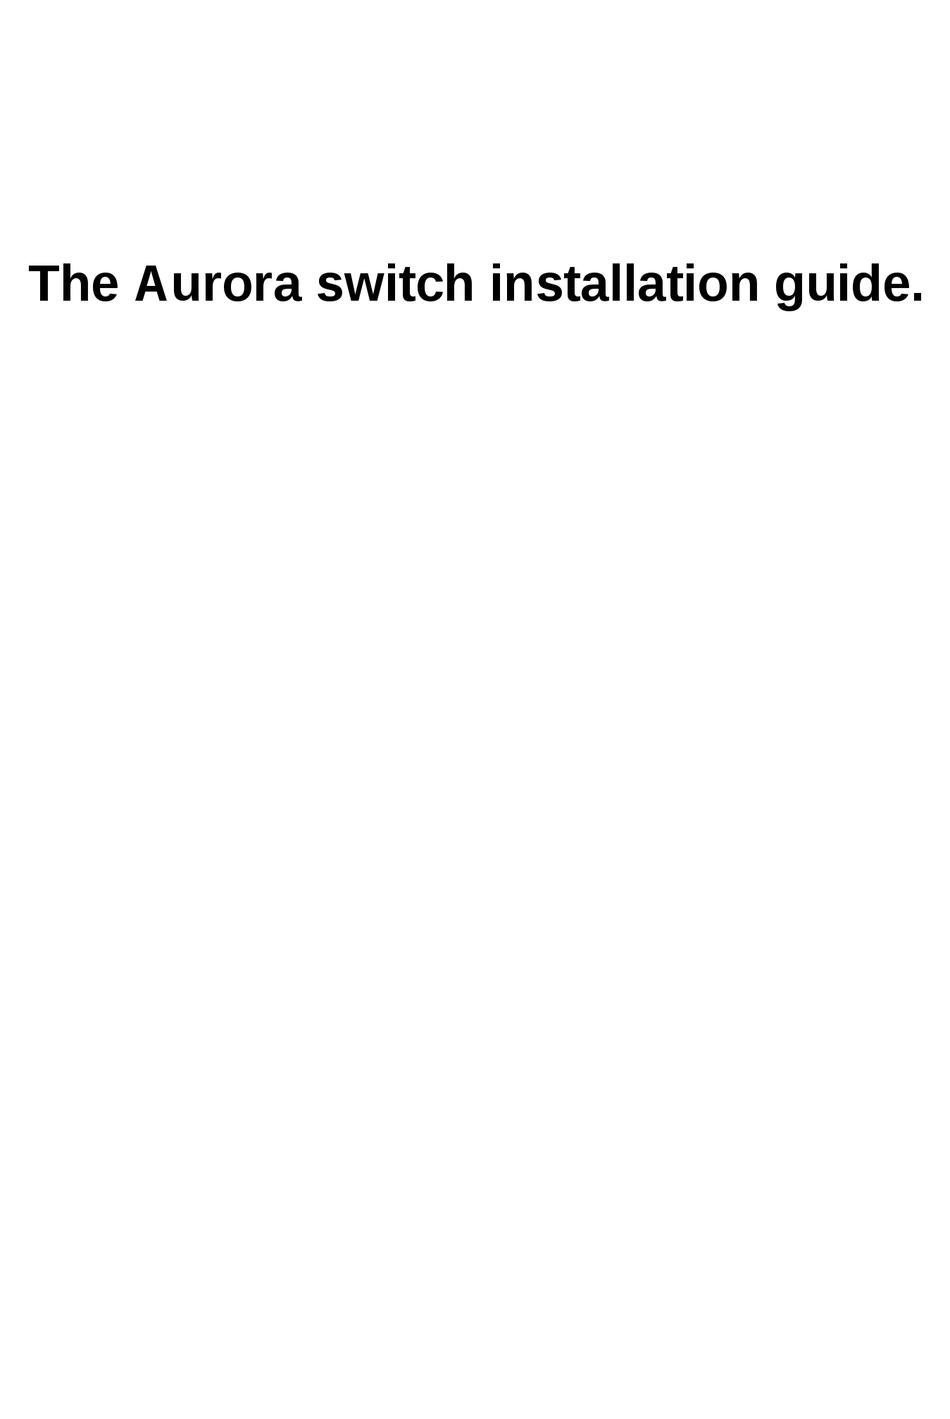 netberg aurora 720